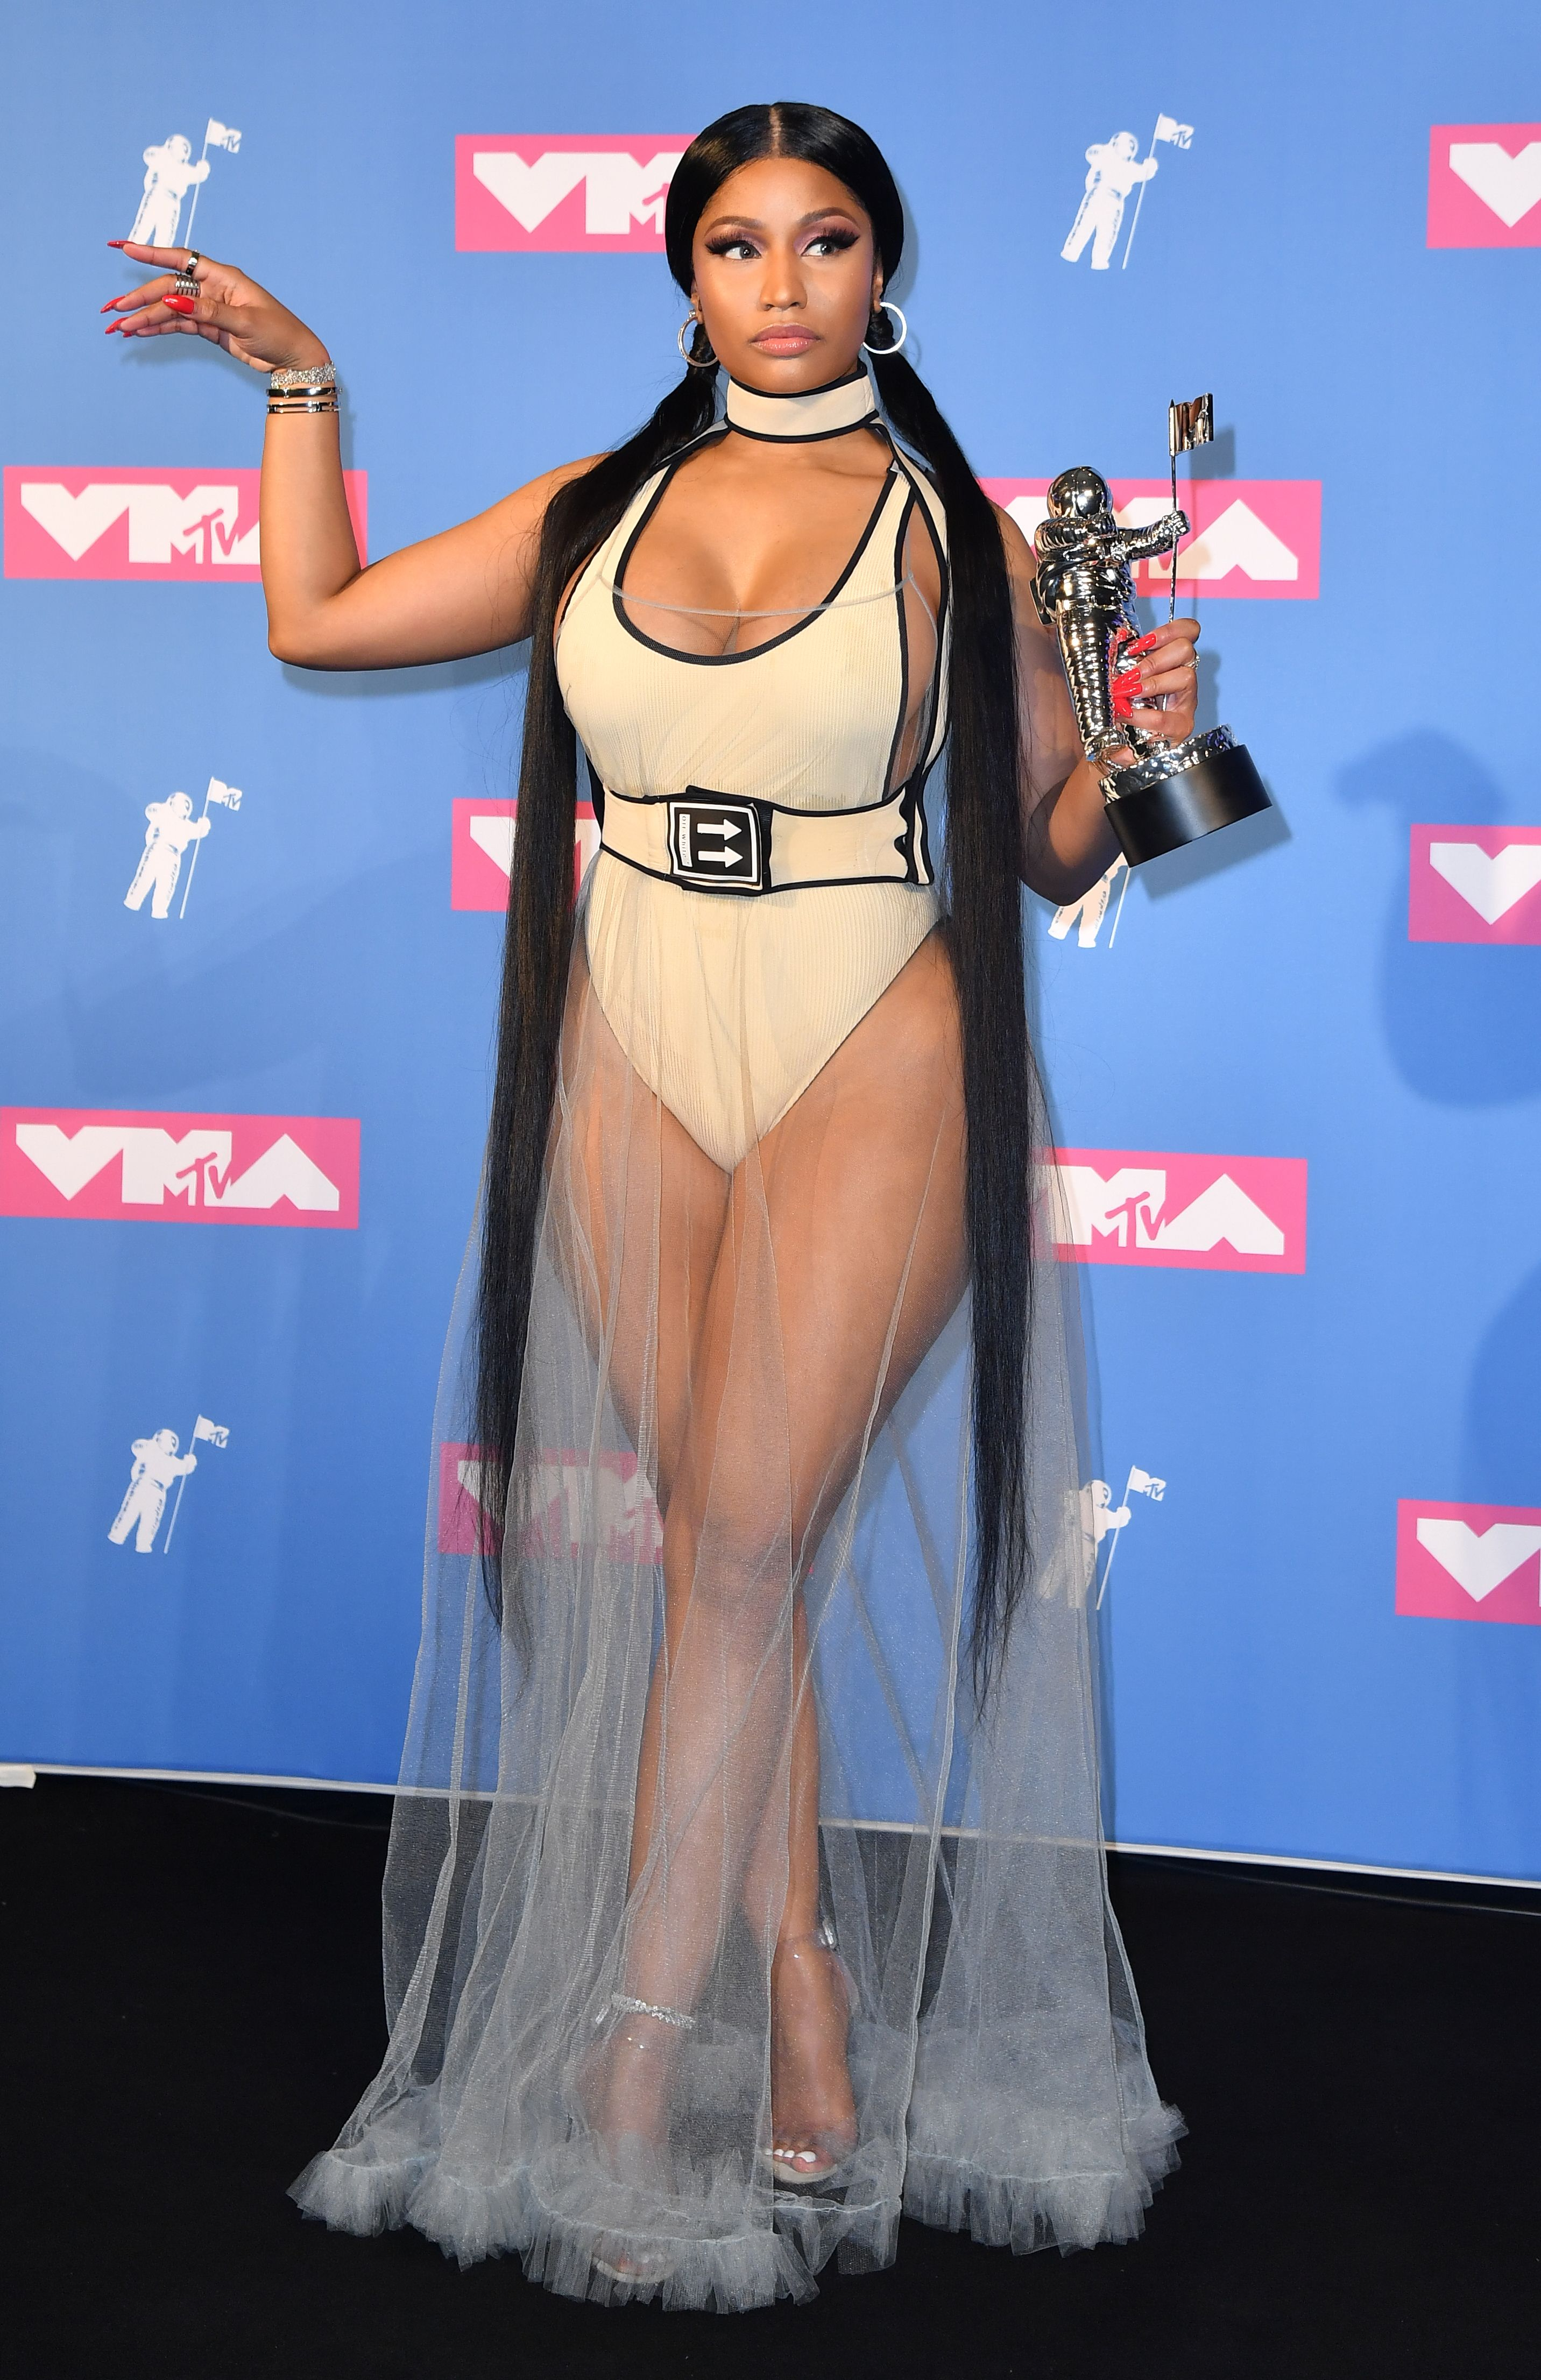 Nicki Minaj, cintura, cuerpo